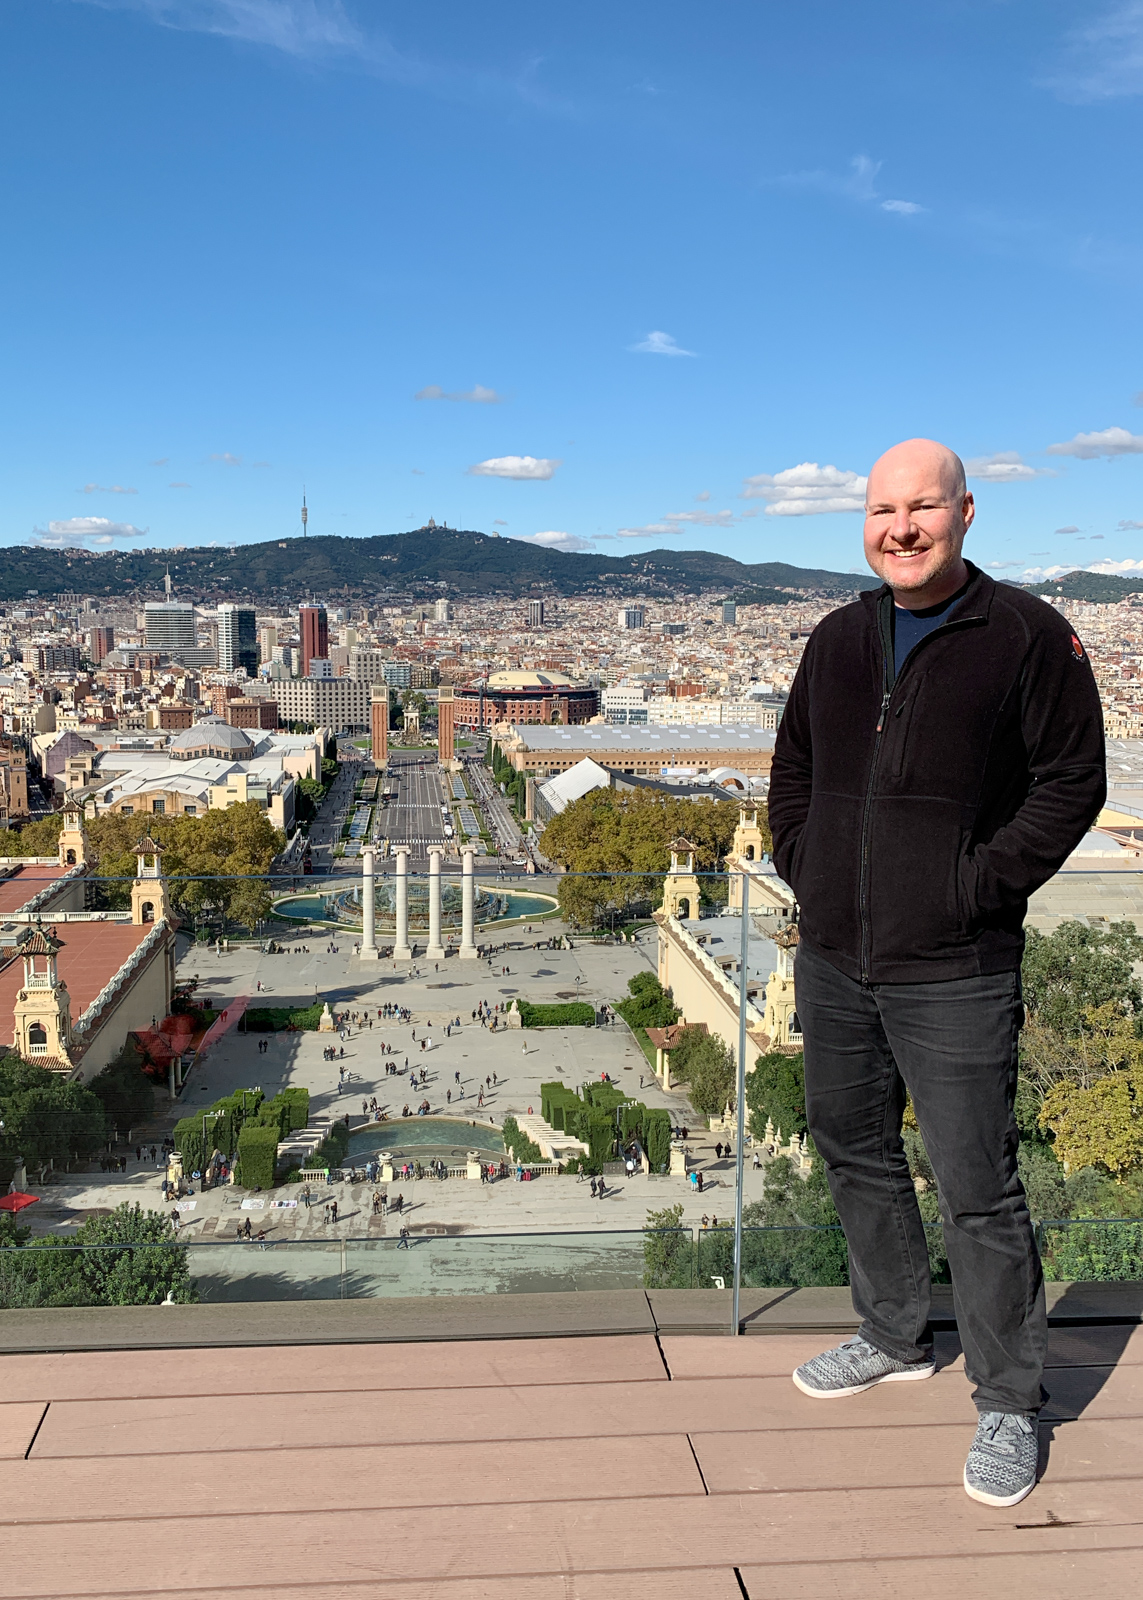 View of Barcelona from Museu Nacional d'Art de Catalunya